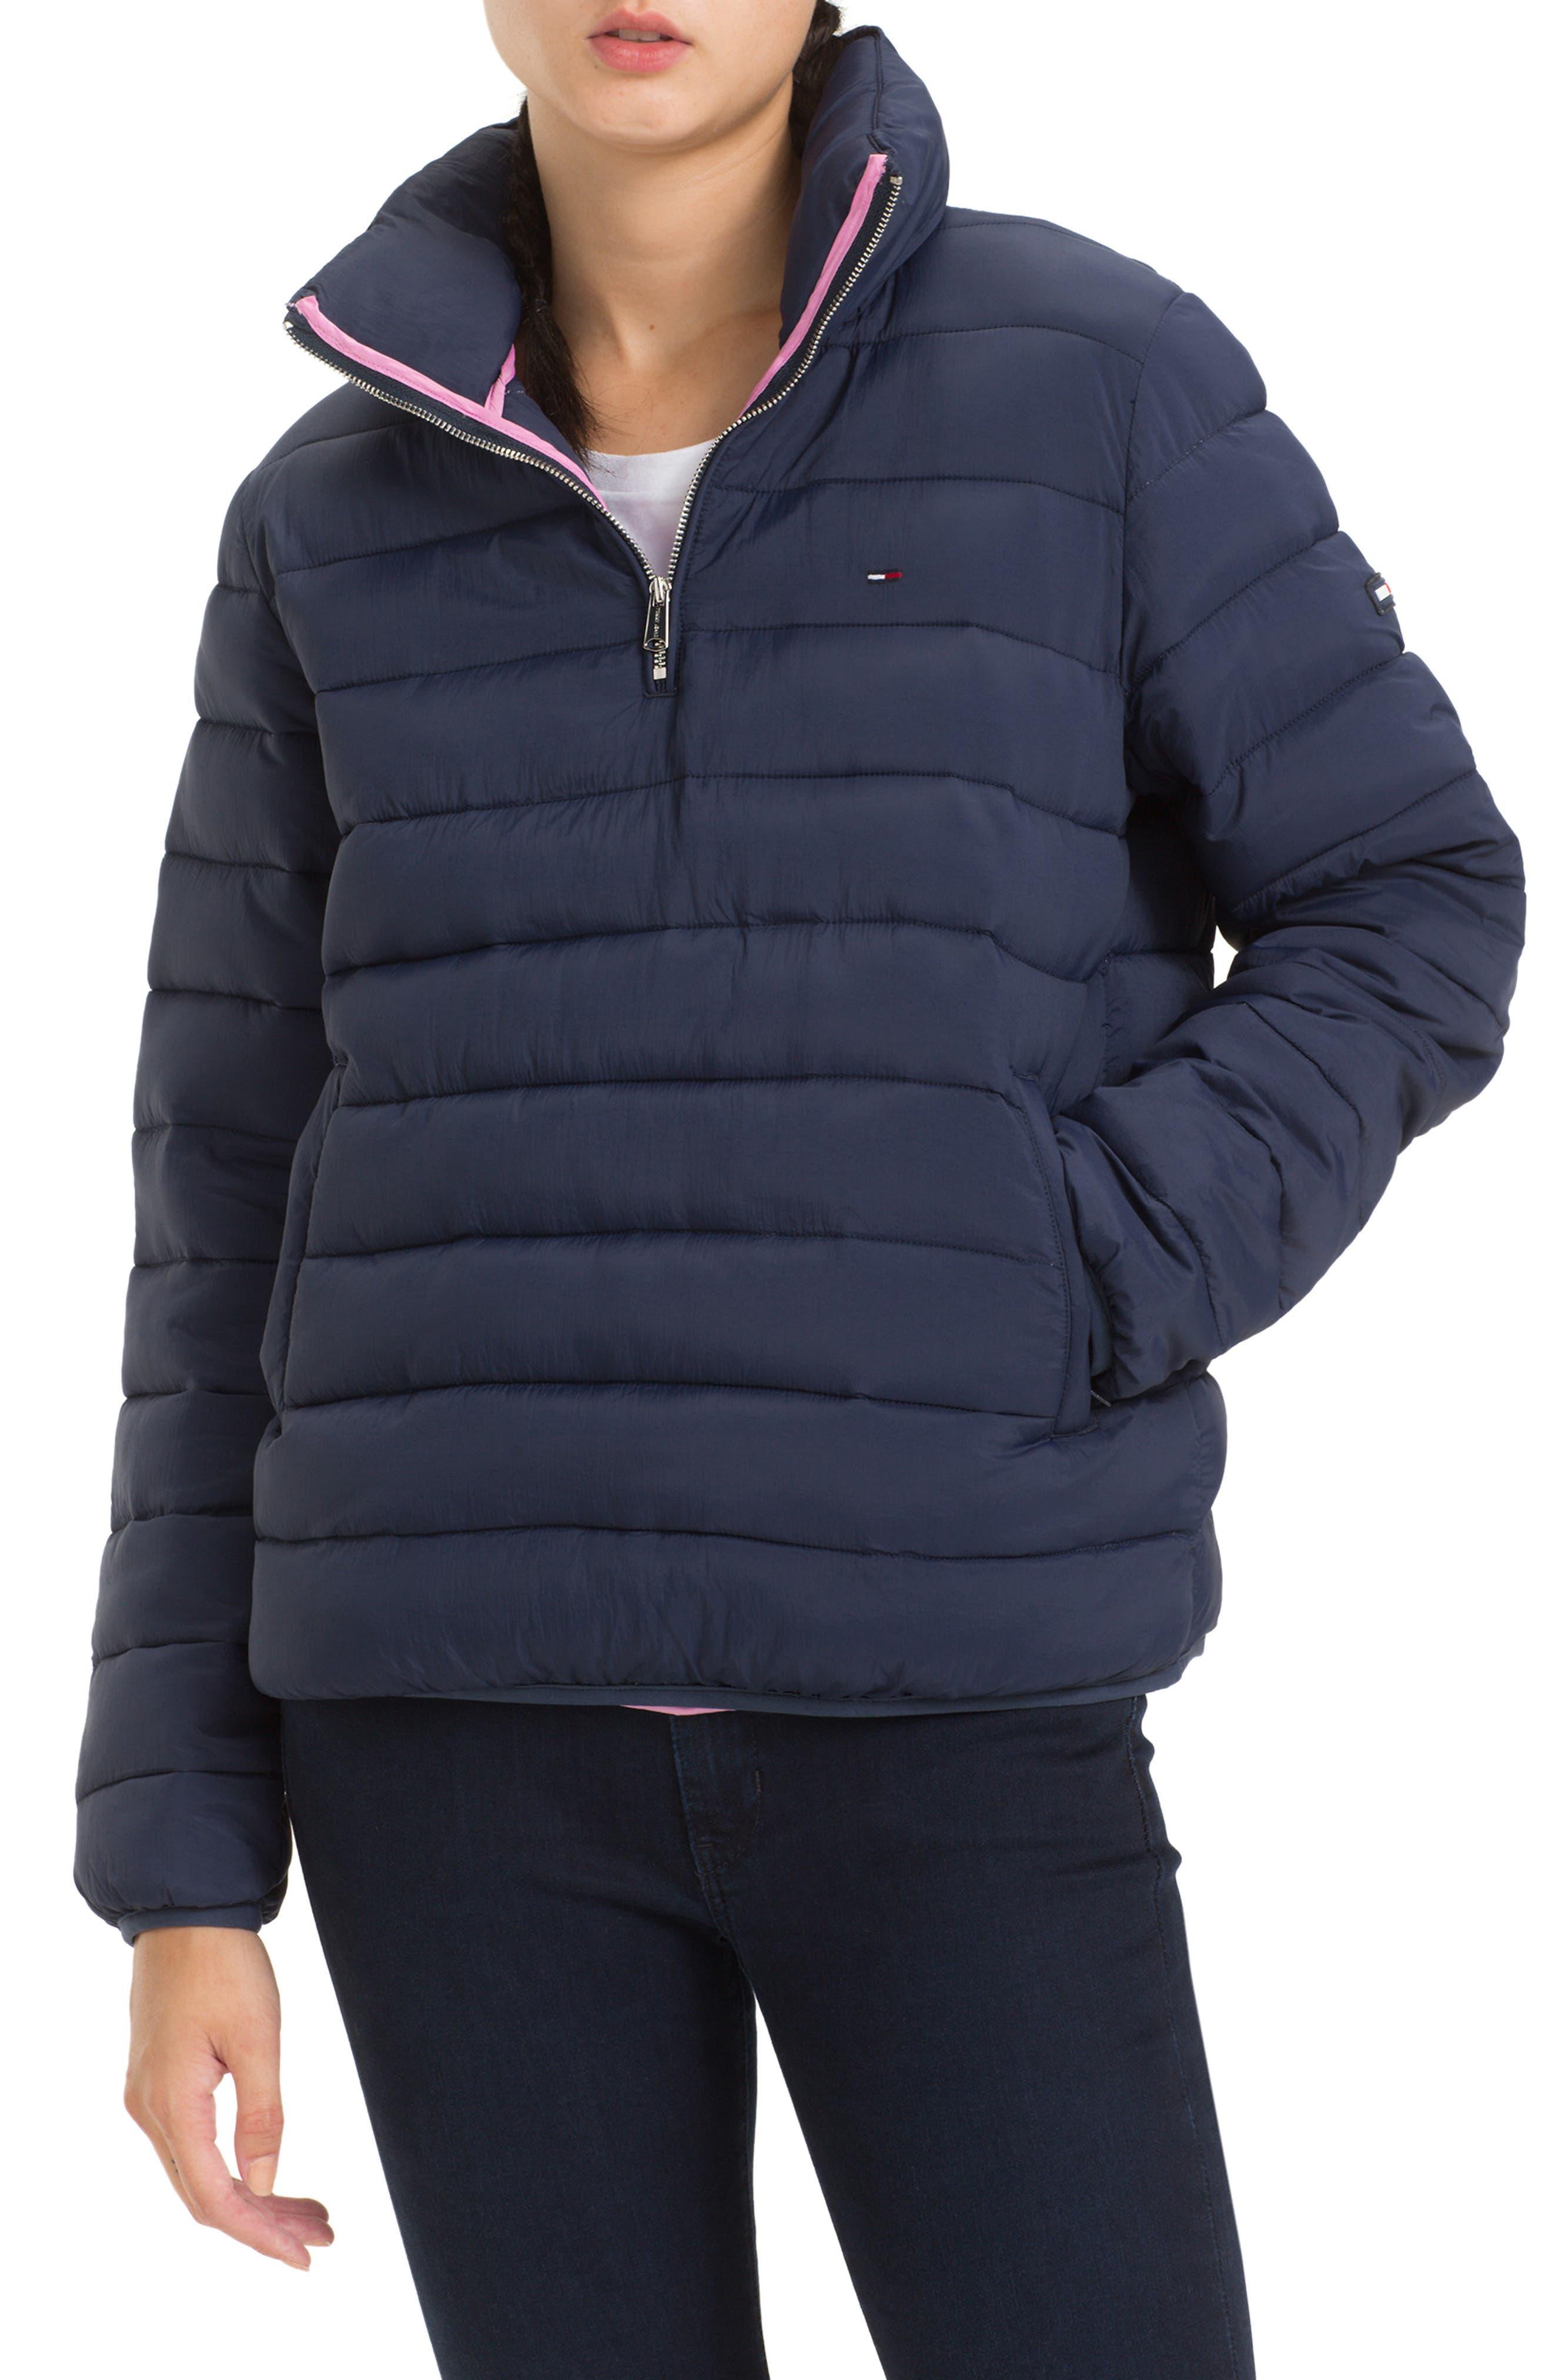 TJW Quilted Half-Zip Puffer Jacket,                             Main thumbnail 1, color,                             BLACK IRIS